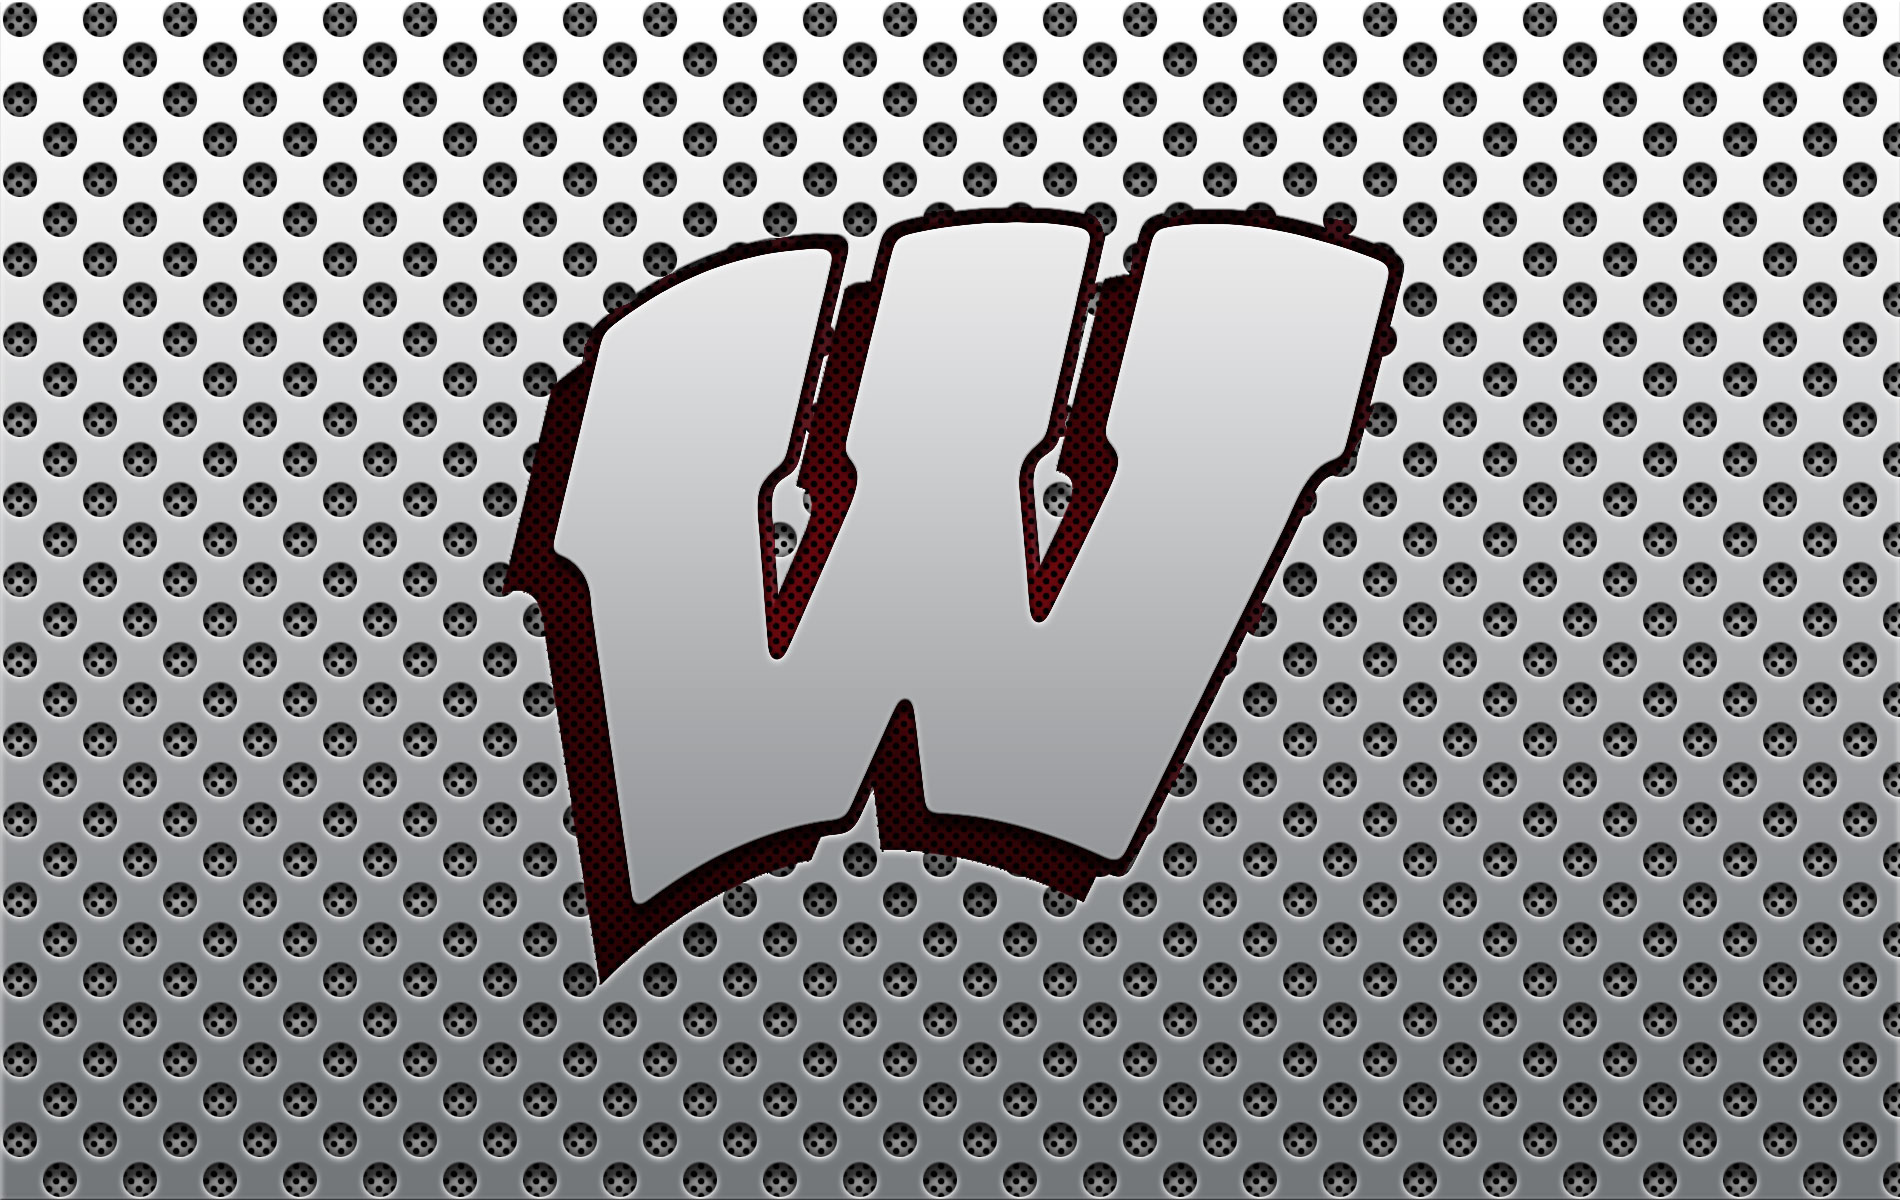 Wisconsin Badger Logo Wallpaper 365 Days of Design 1900x1200